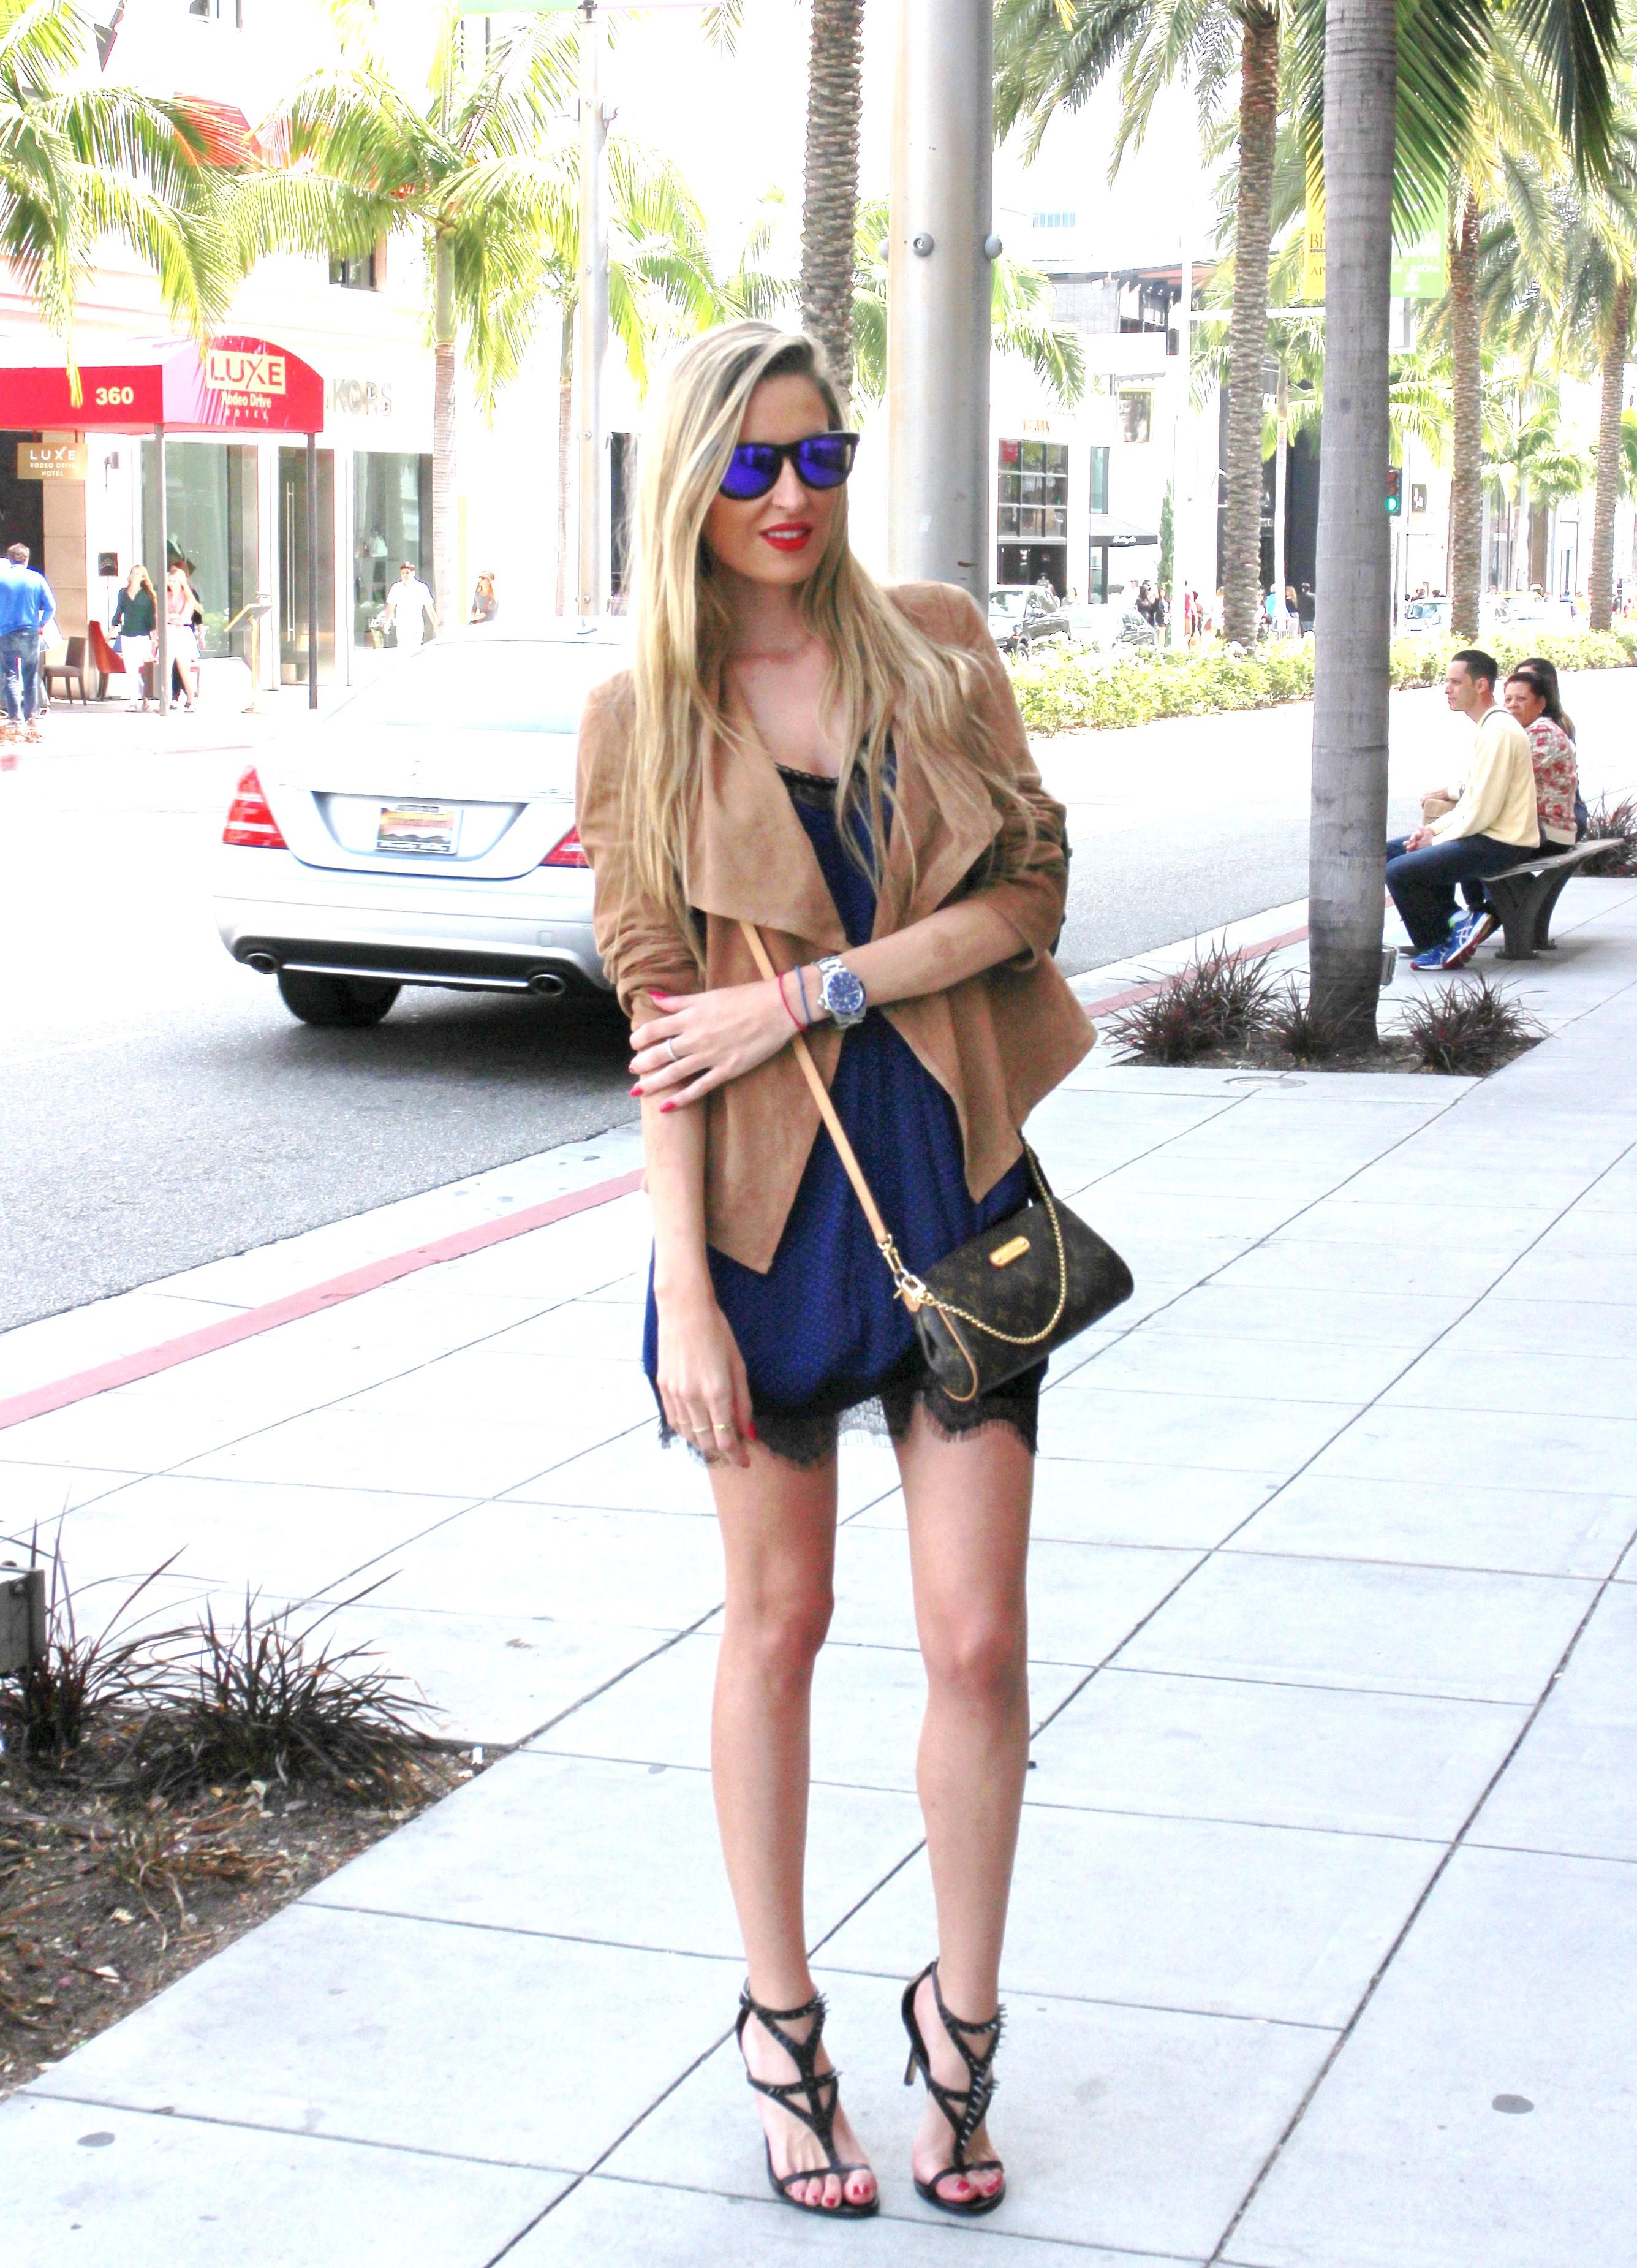 Rodeo_Drive_Los_Angeles_California_Shopping_Lara_Martin_Gilarranz_Bymyheels (4)